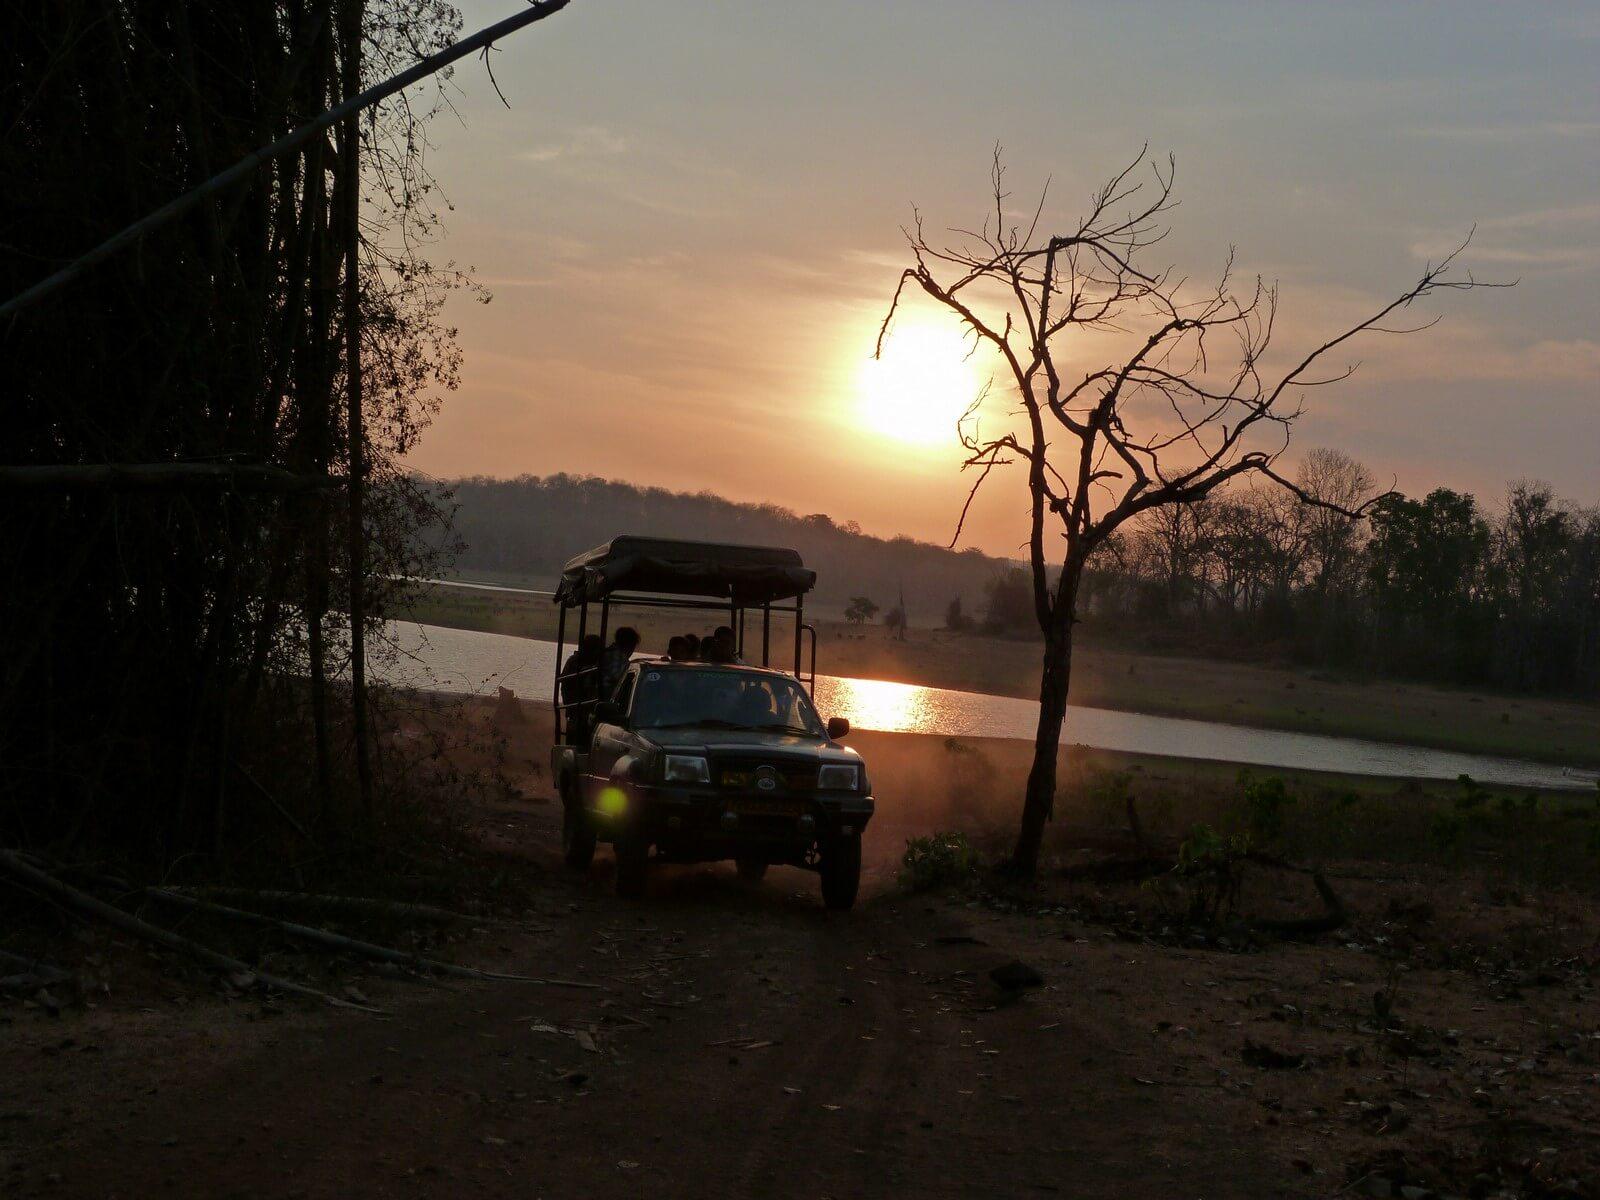 Safari Jeep against the sunset